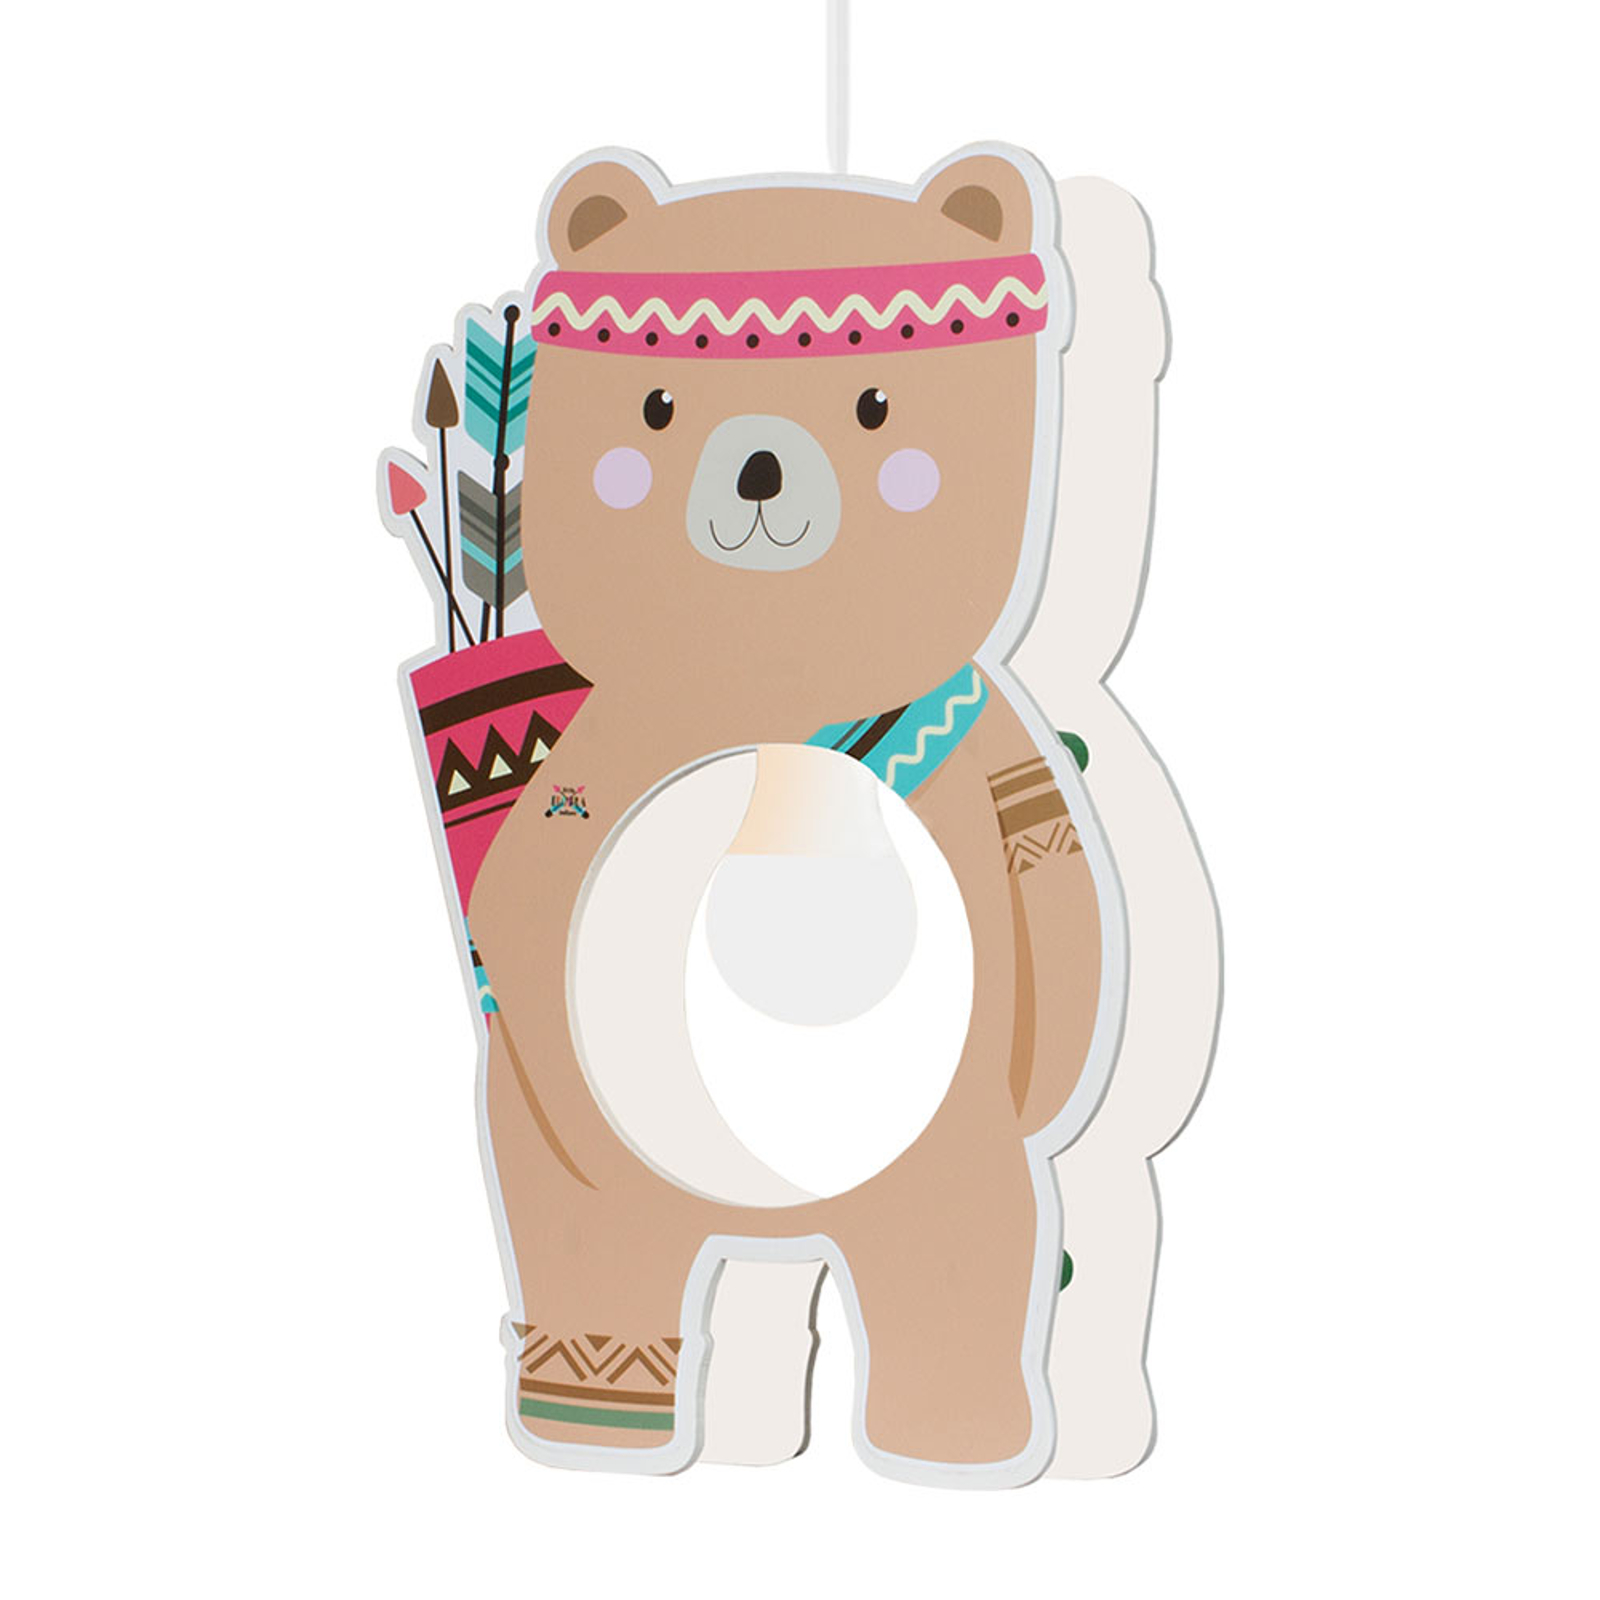 Lampa wisząca Little Indians, niedźwiedź Bjørn